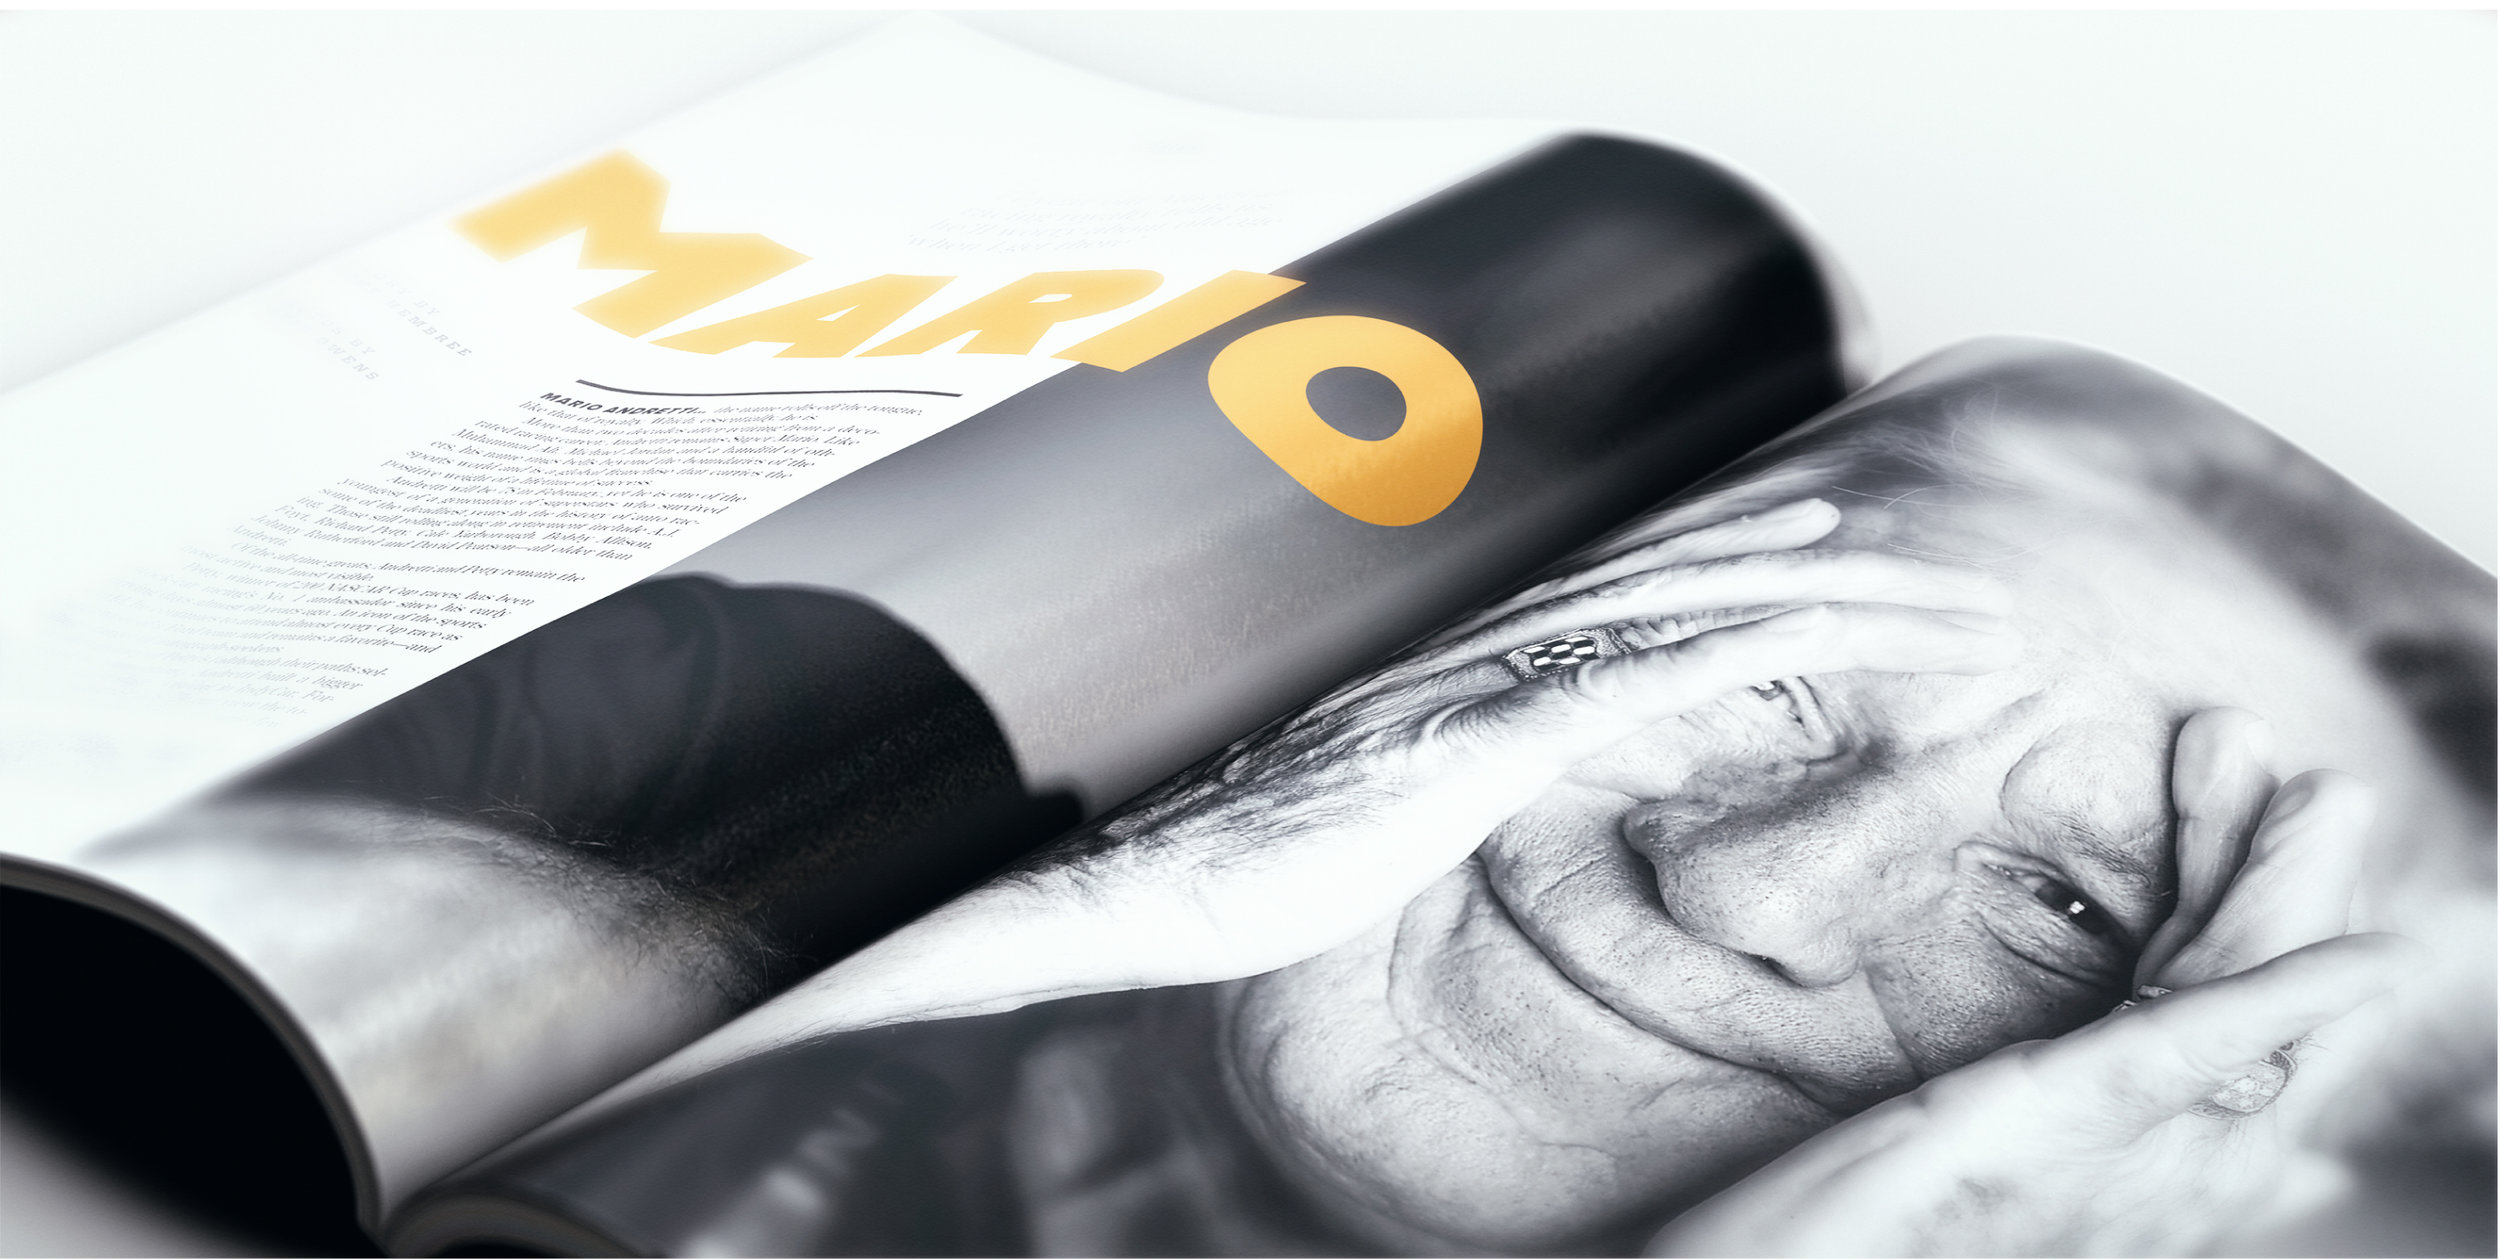 autoweek-magazine-mockup3@2x-100.jpg